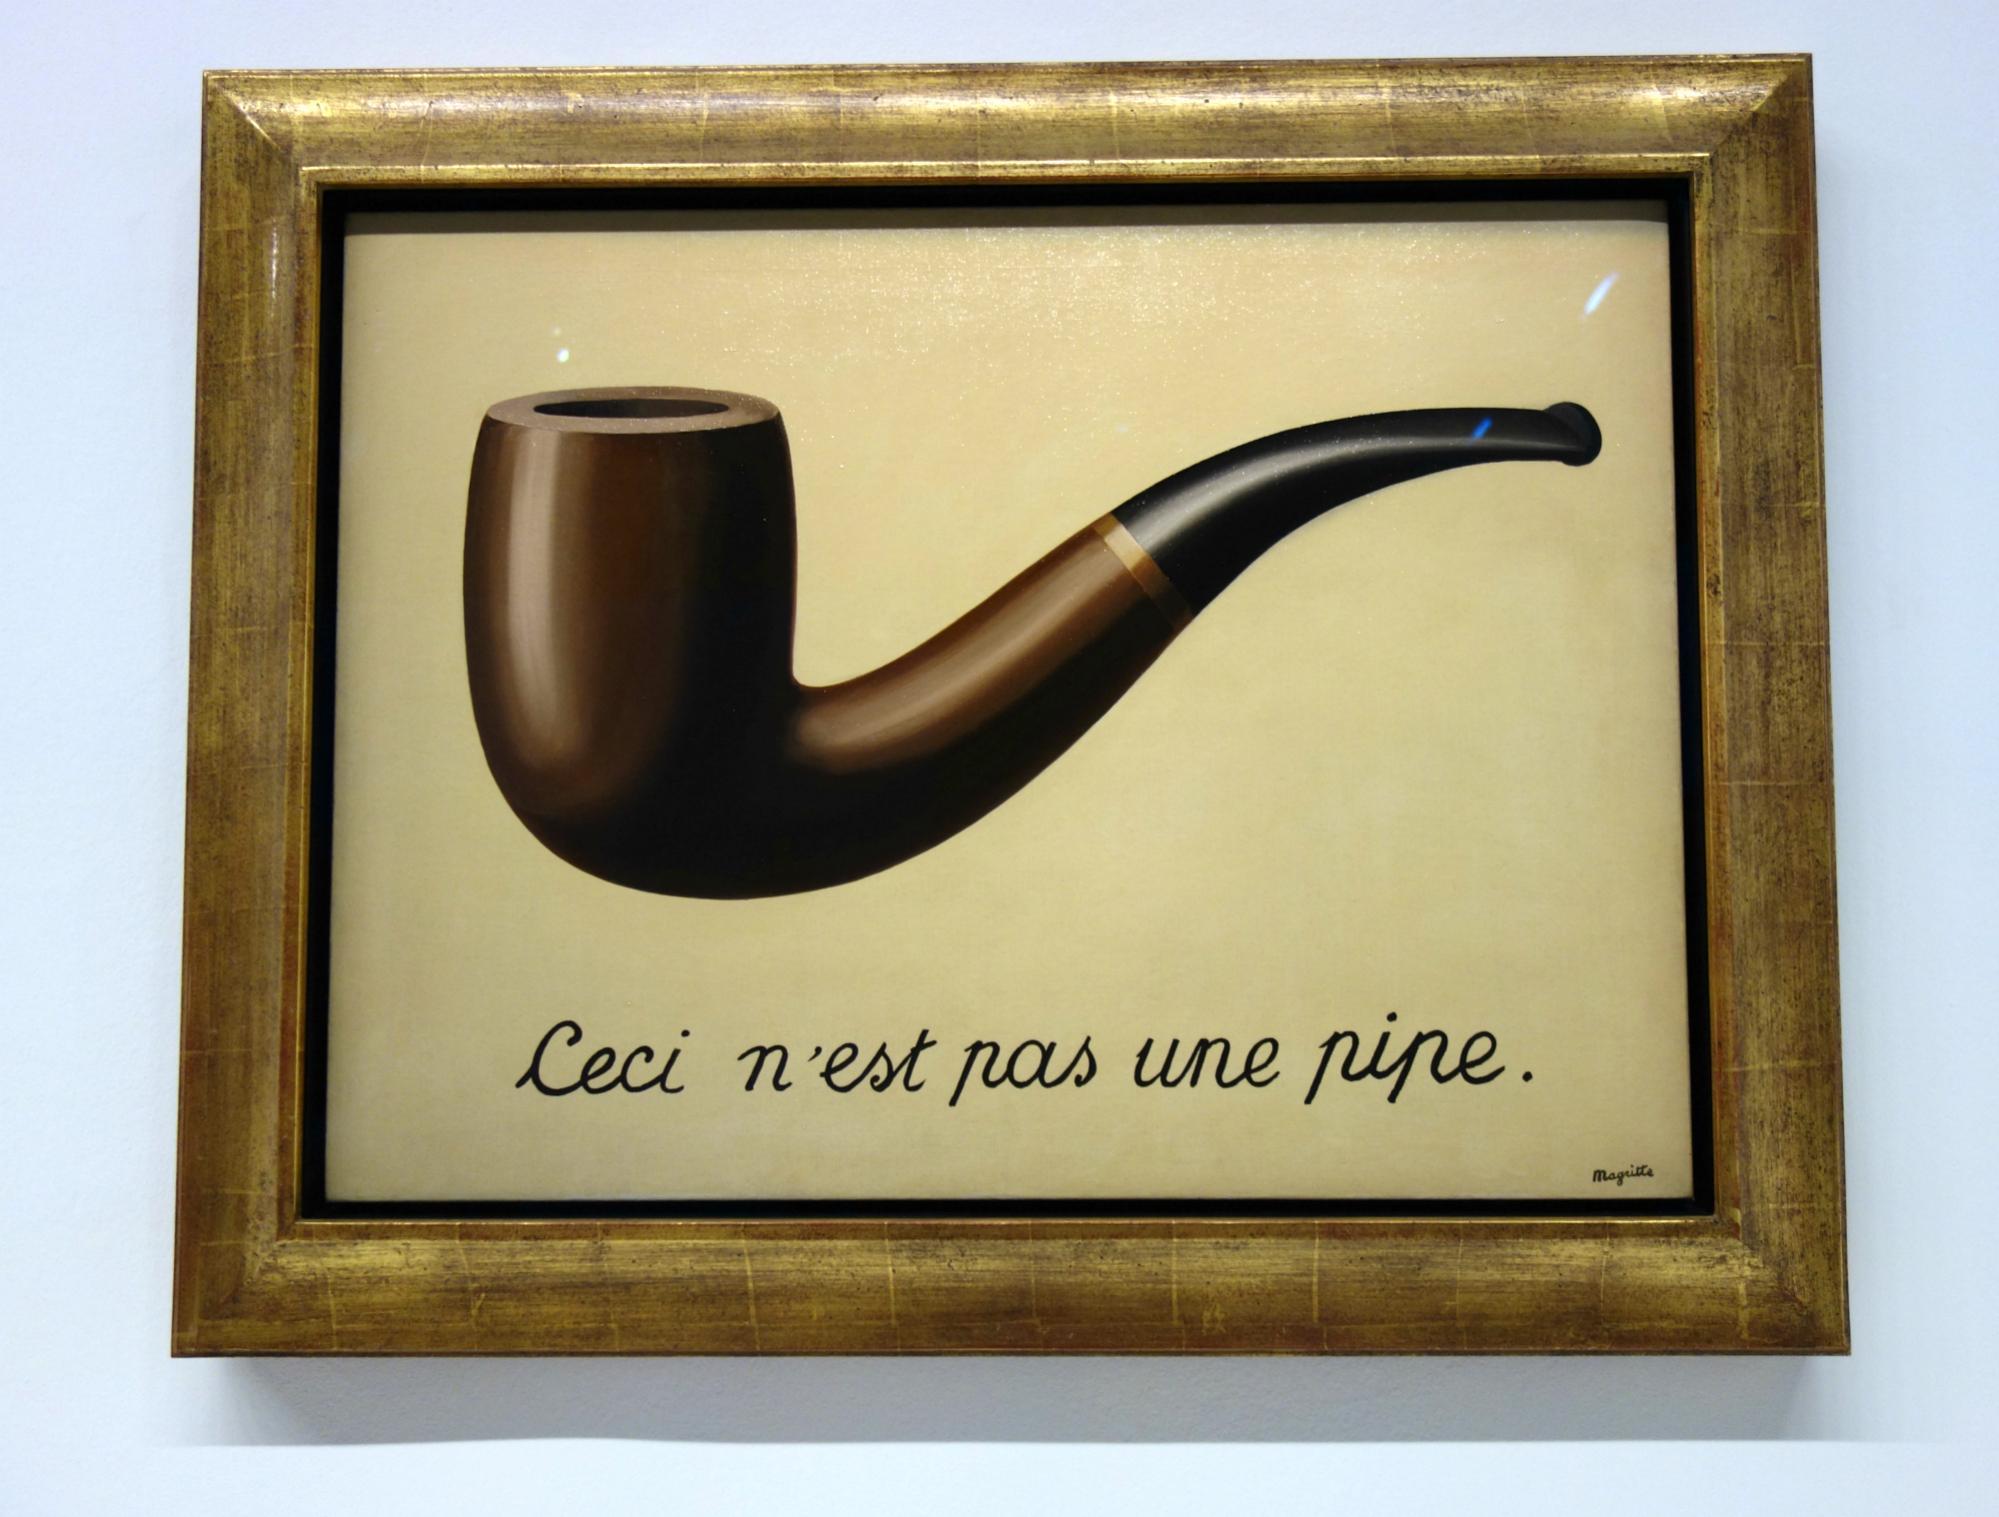 Name:  The-treachery-of-images-Renée-Magritte-at-the-Pompidou-©Sylvia-DavisJPG.jpg Views: 165 Size:  236.5 קילובייט